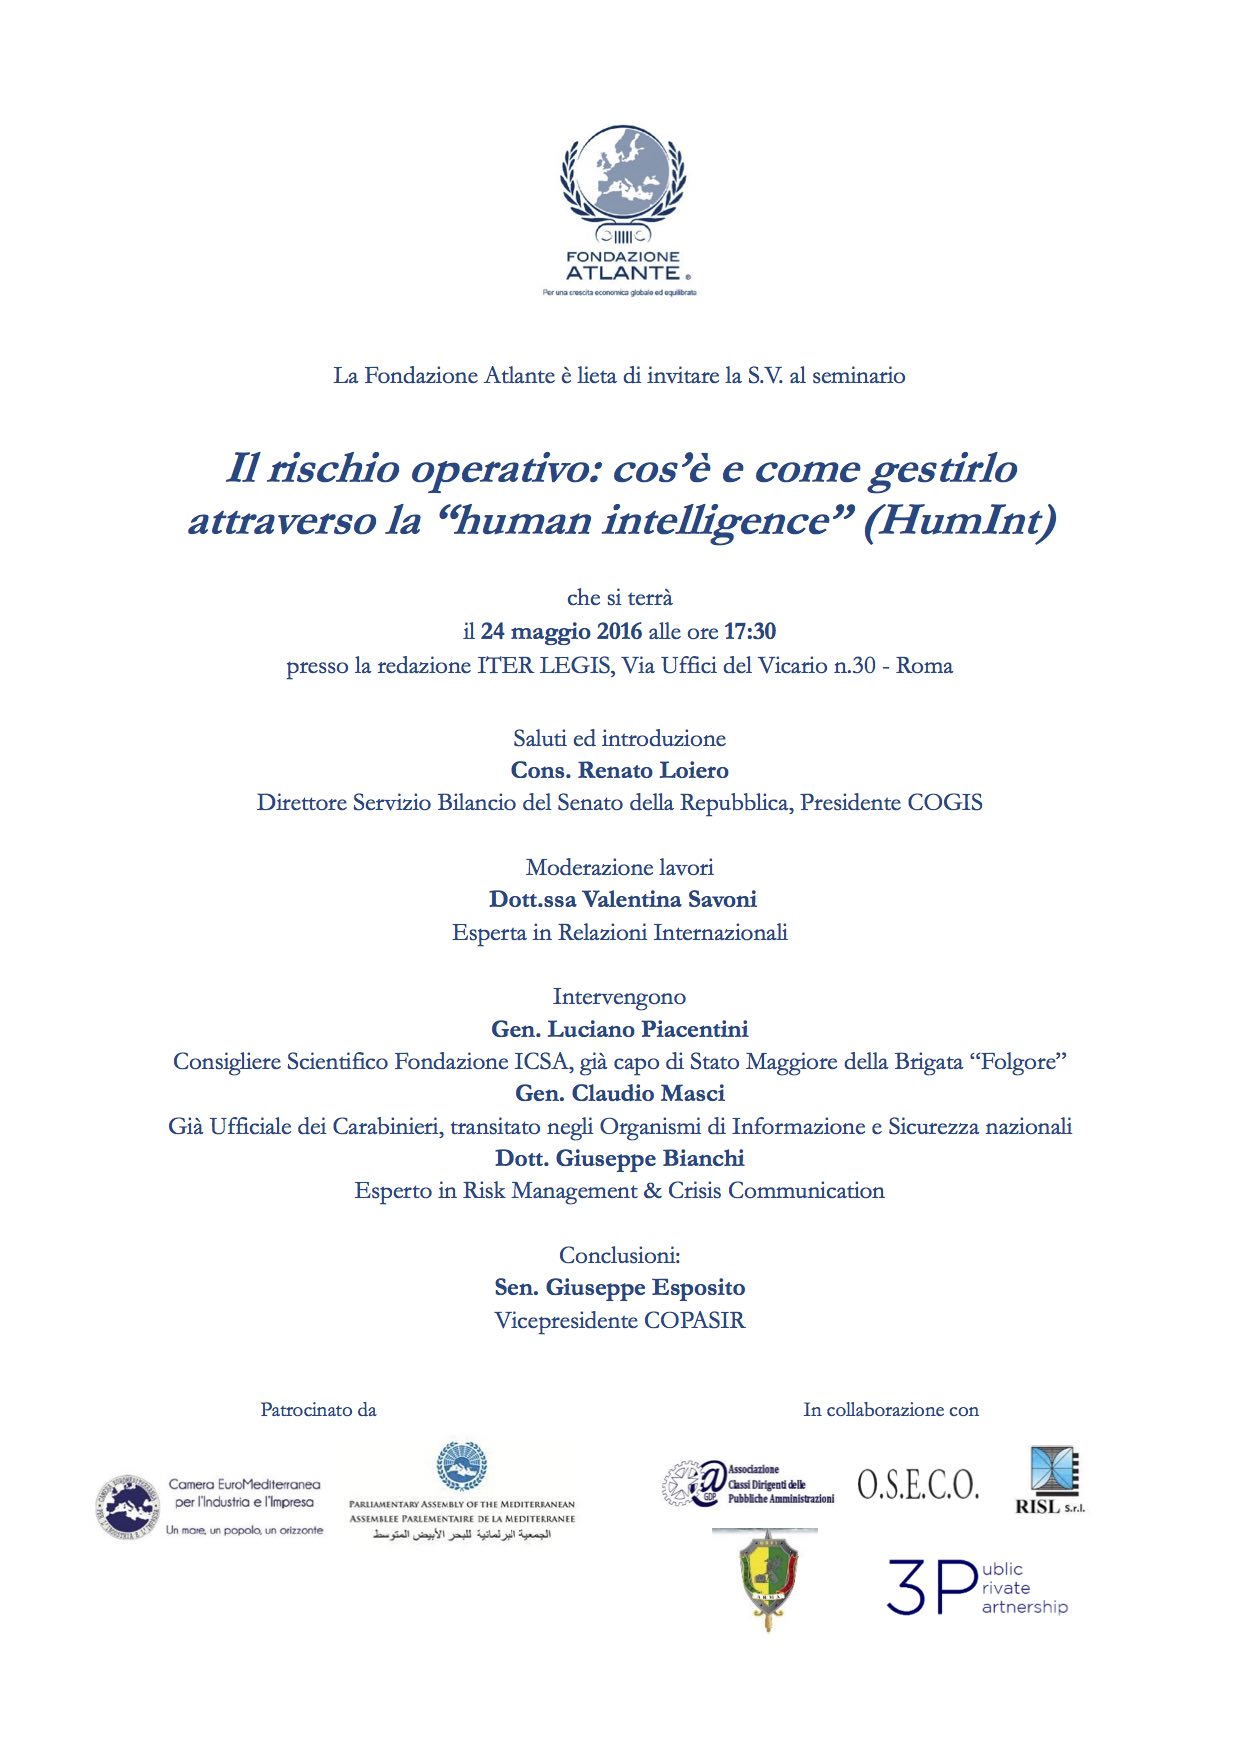 seminario_Fond_Atlante_intelligence-1